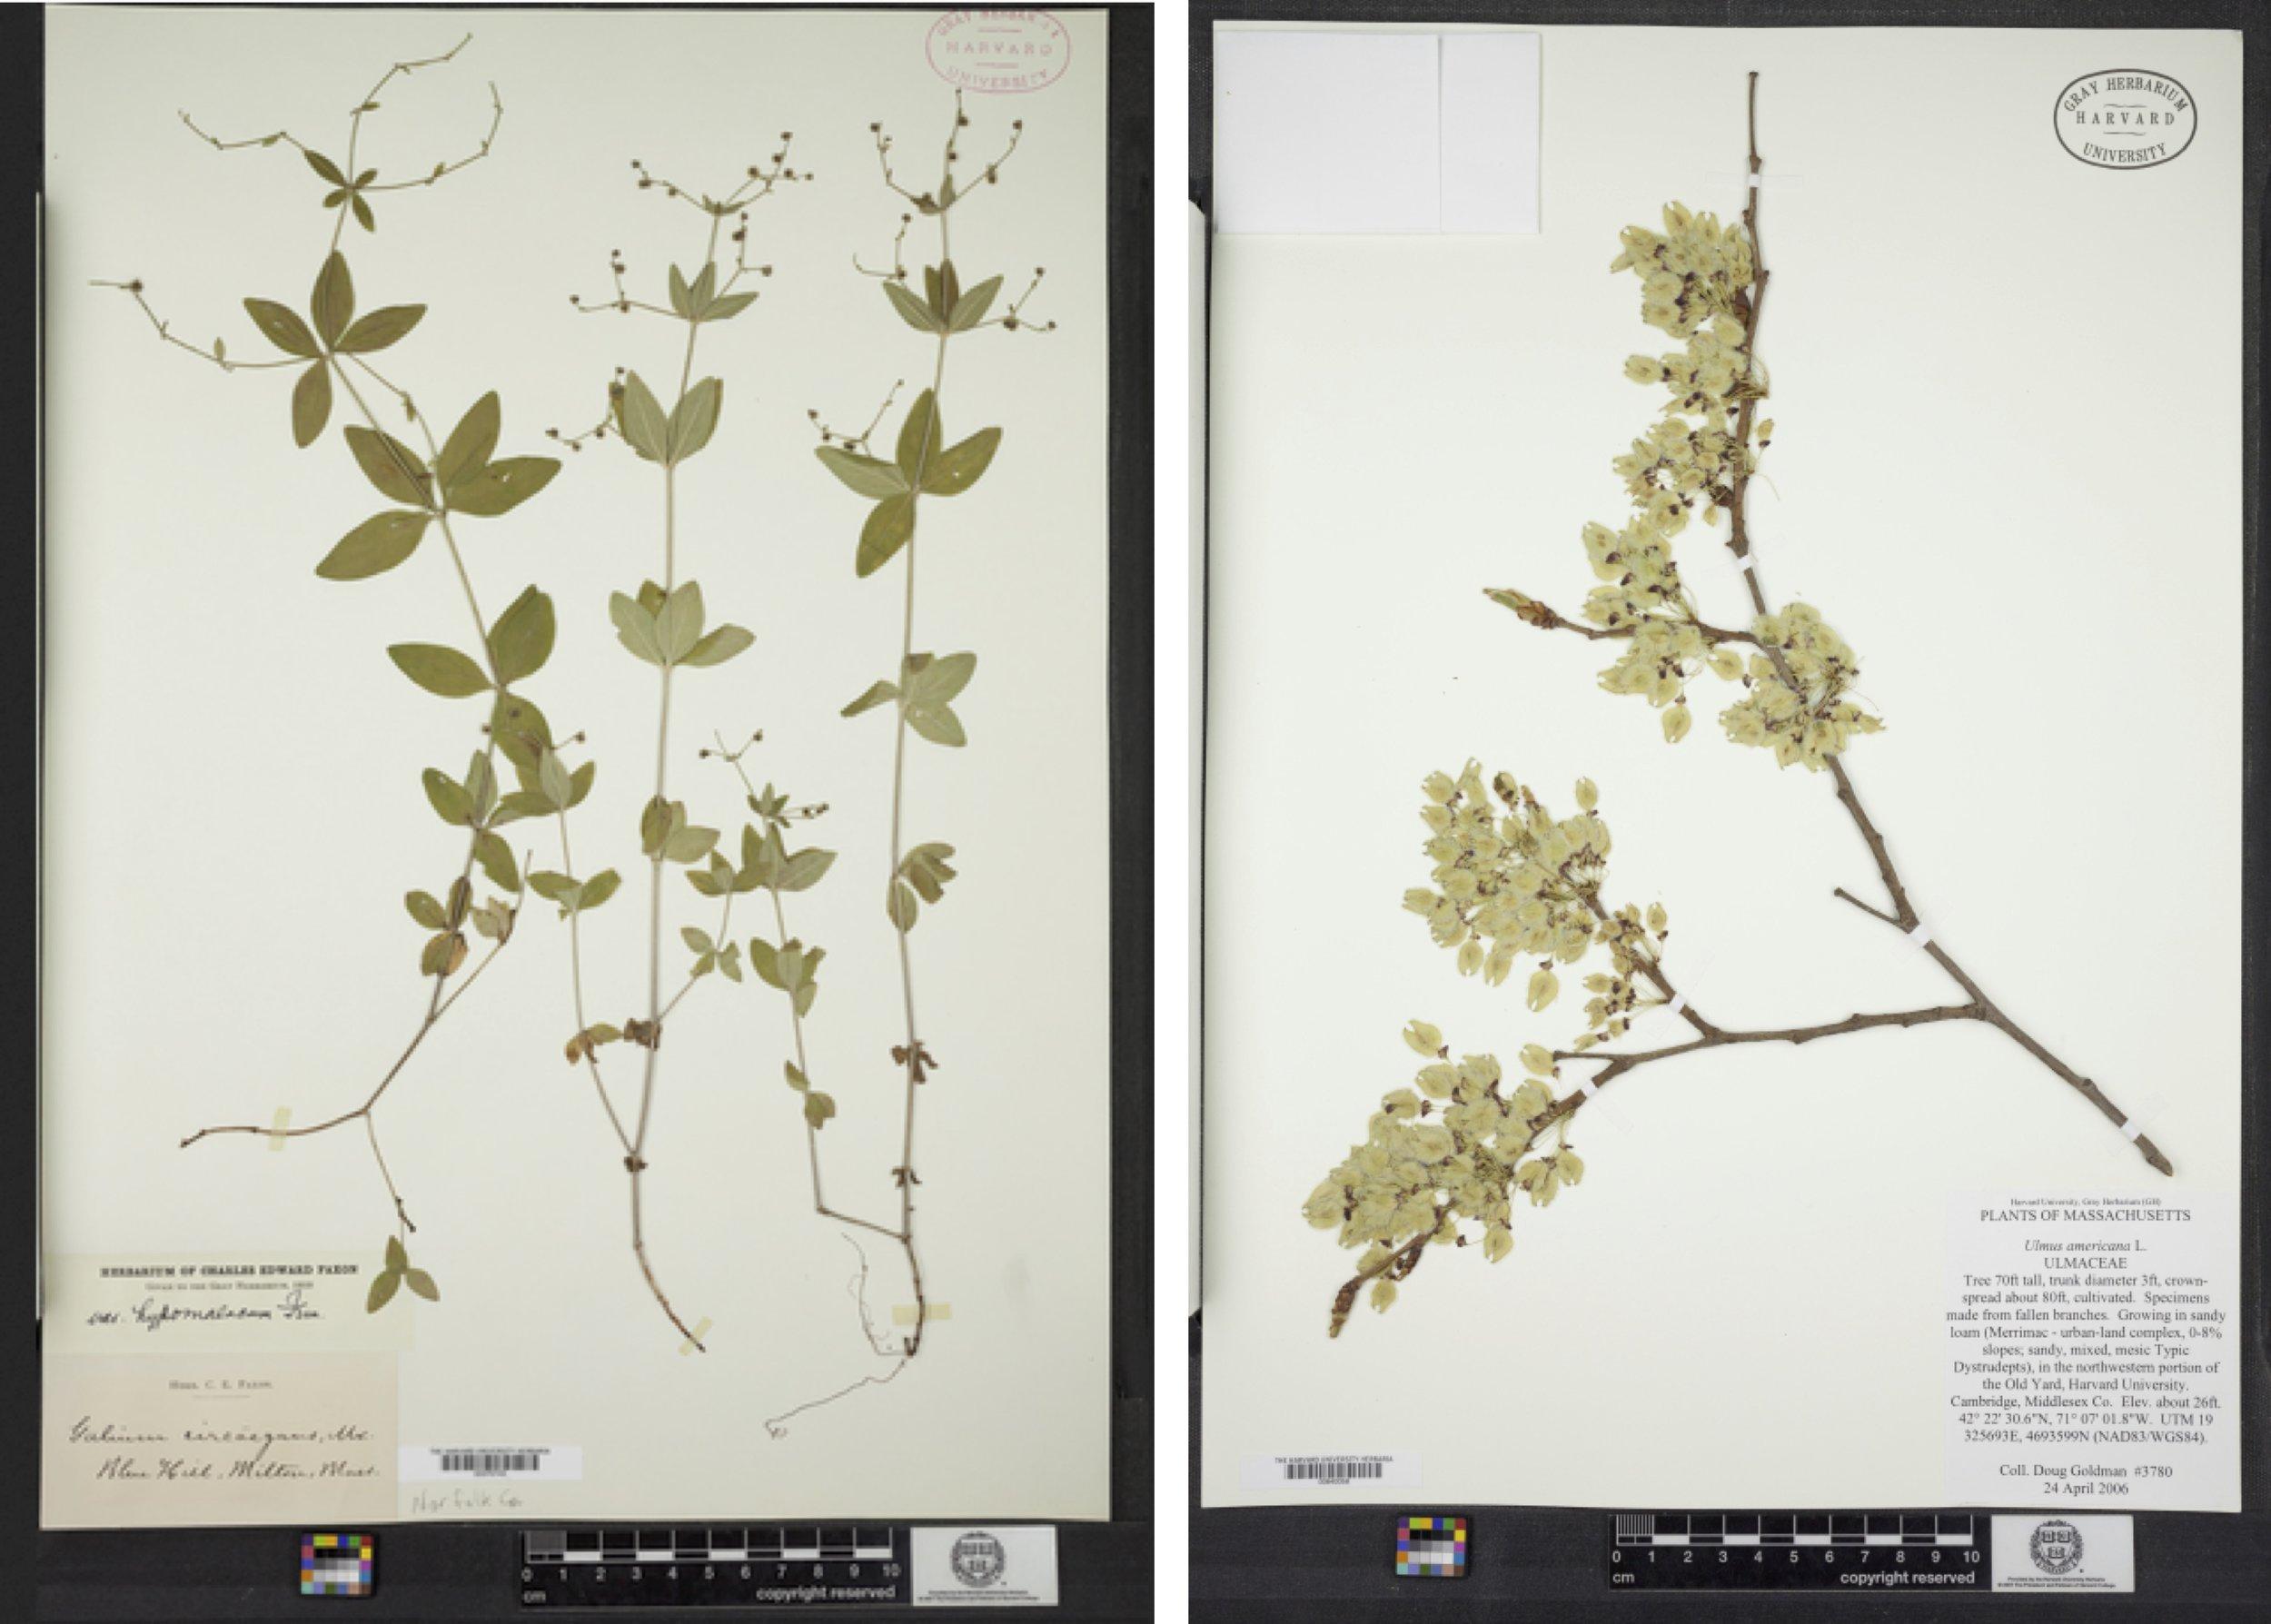 plantspecimen_collage copy.jpg